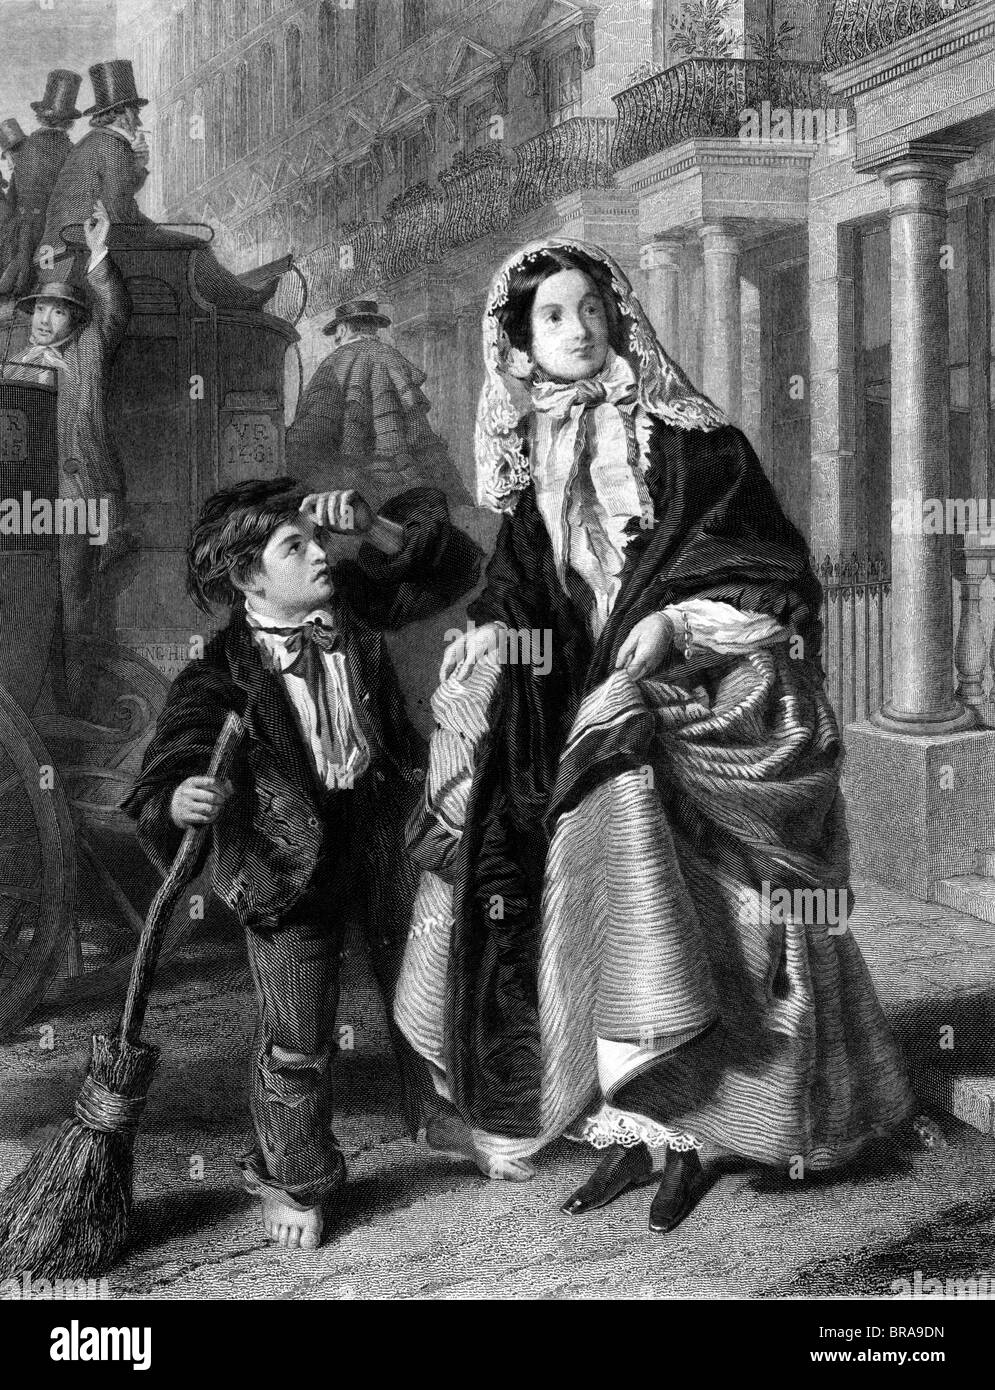 1800s The Crossing Sweeper Victorian London Street Urchin